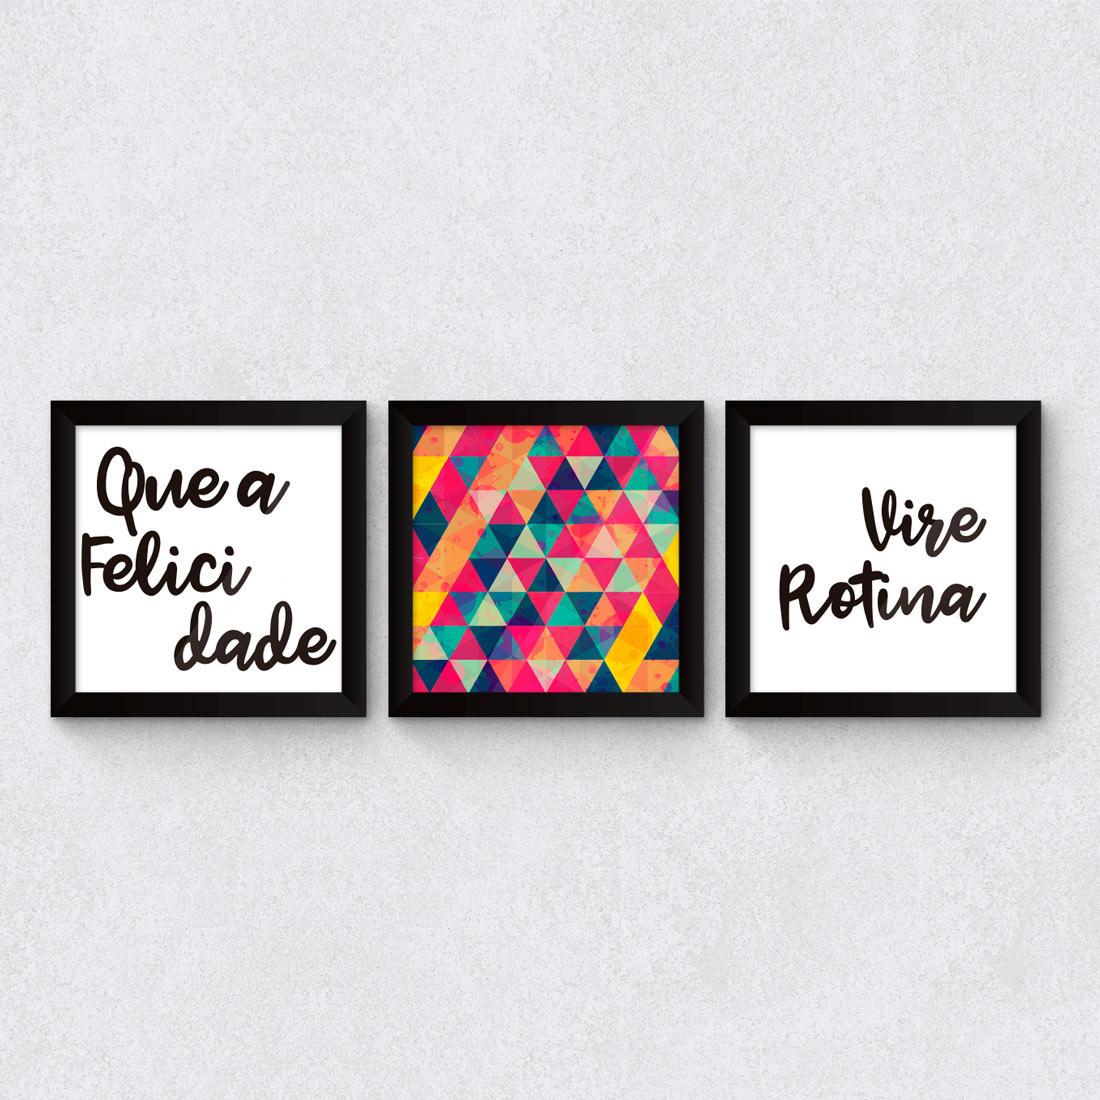 "Conjunto de Quadros Decorativos ""Que a felicidade vire rotina"""